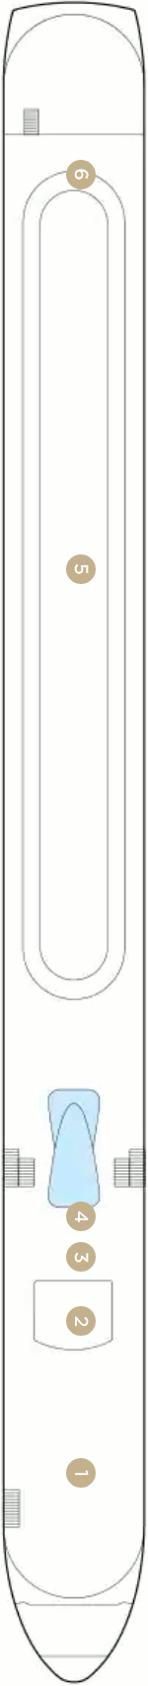 Amalucia Sun Deck Deck Plan